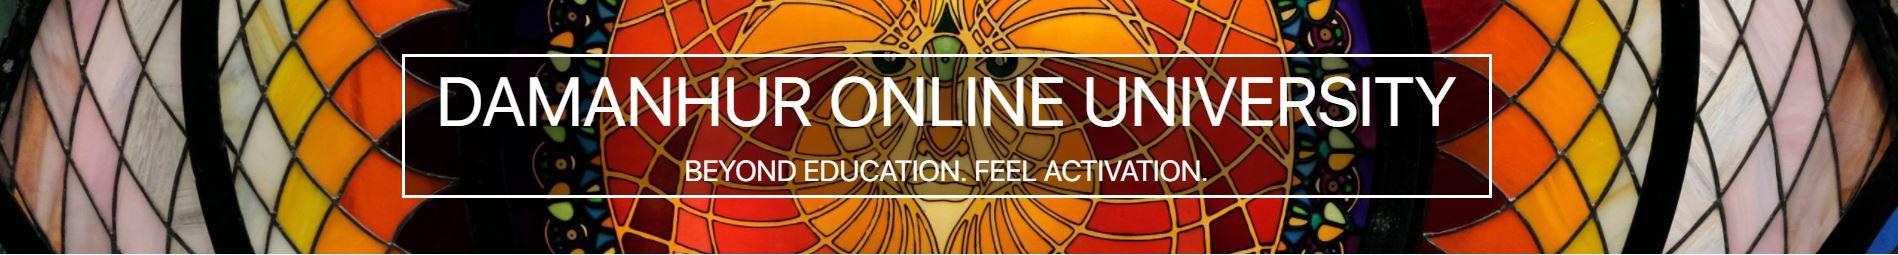 Damanhur Online University